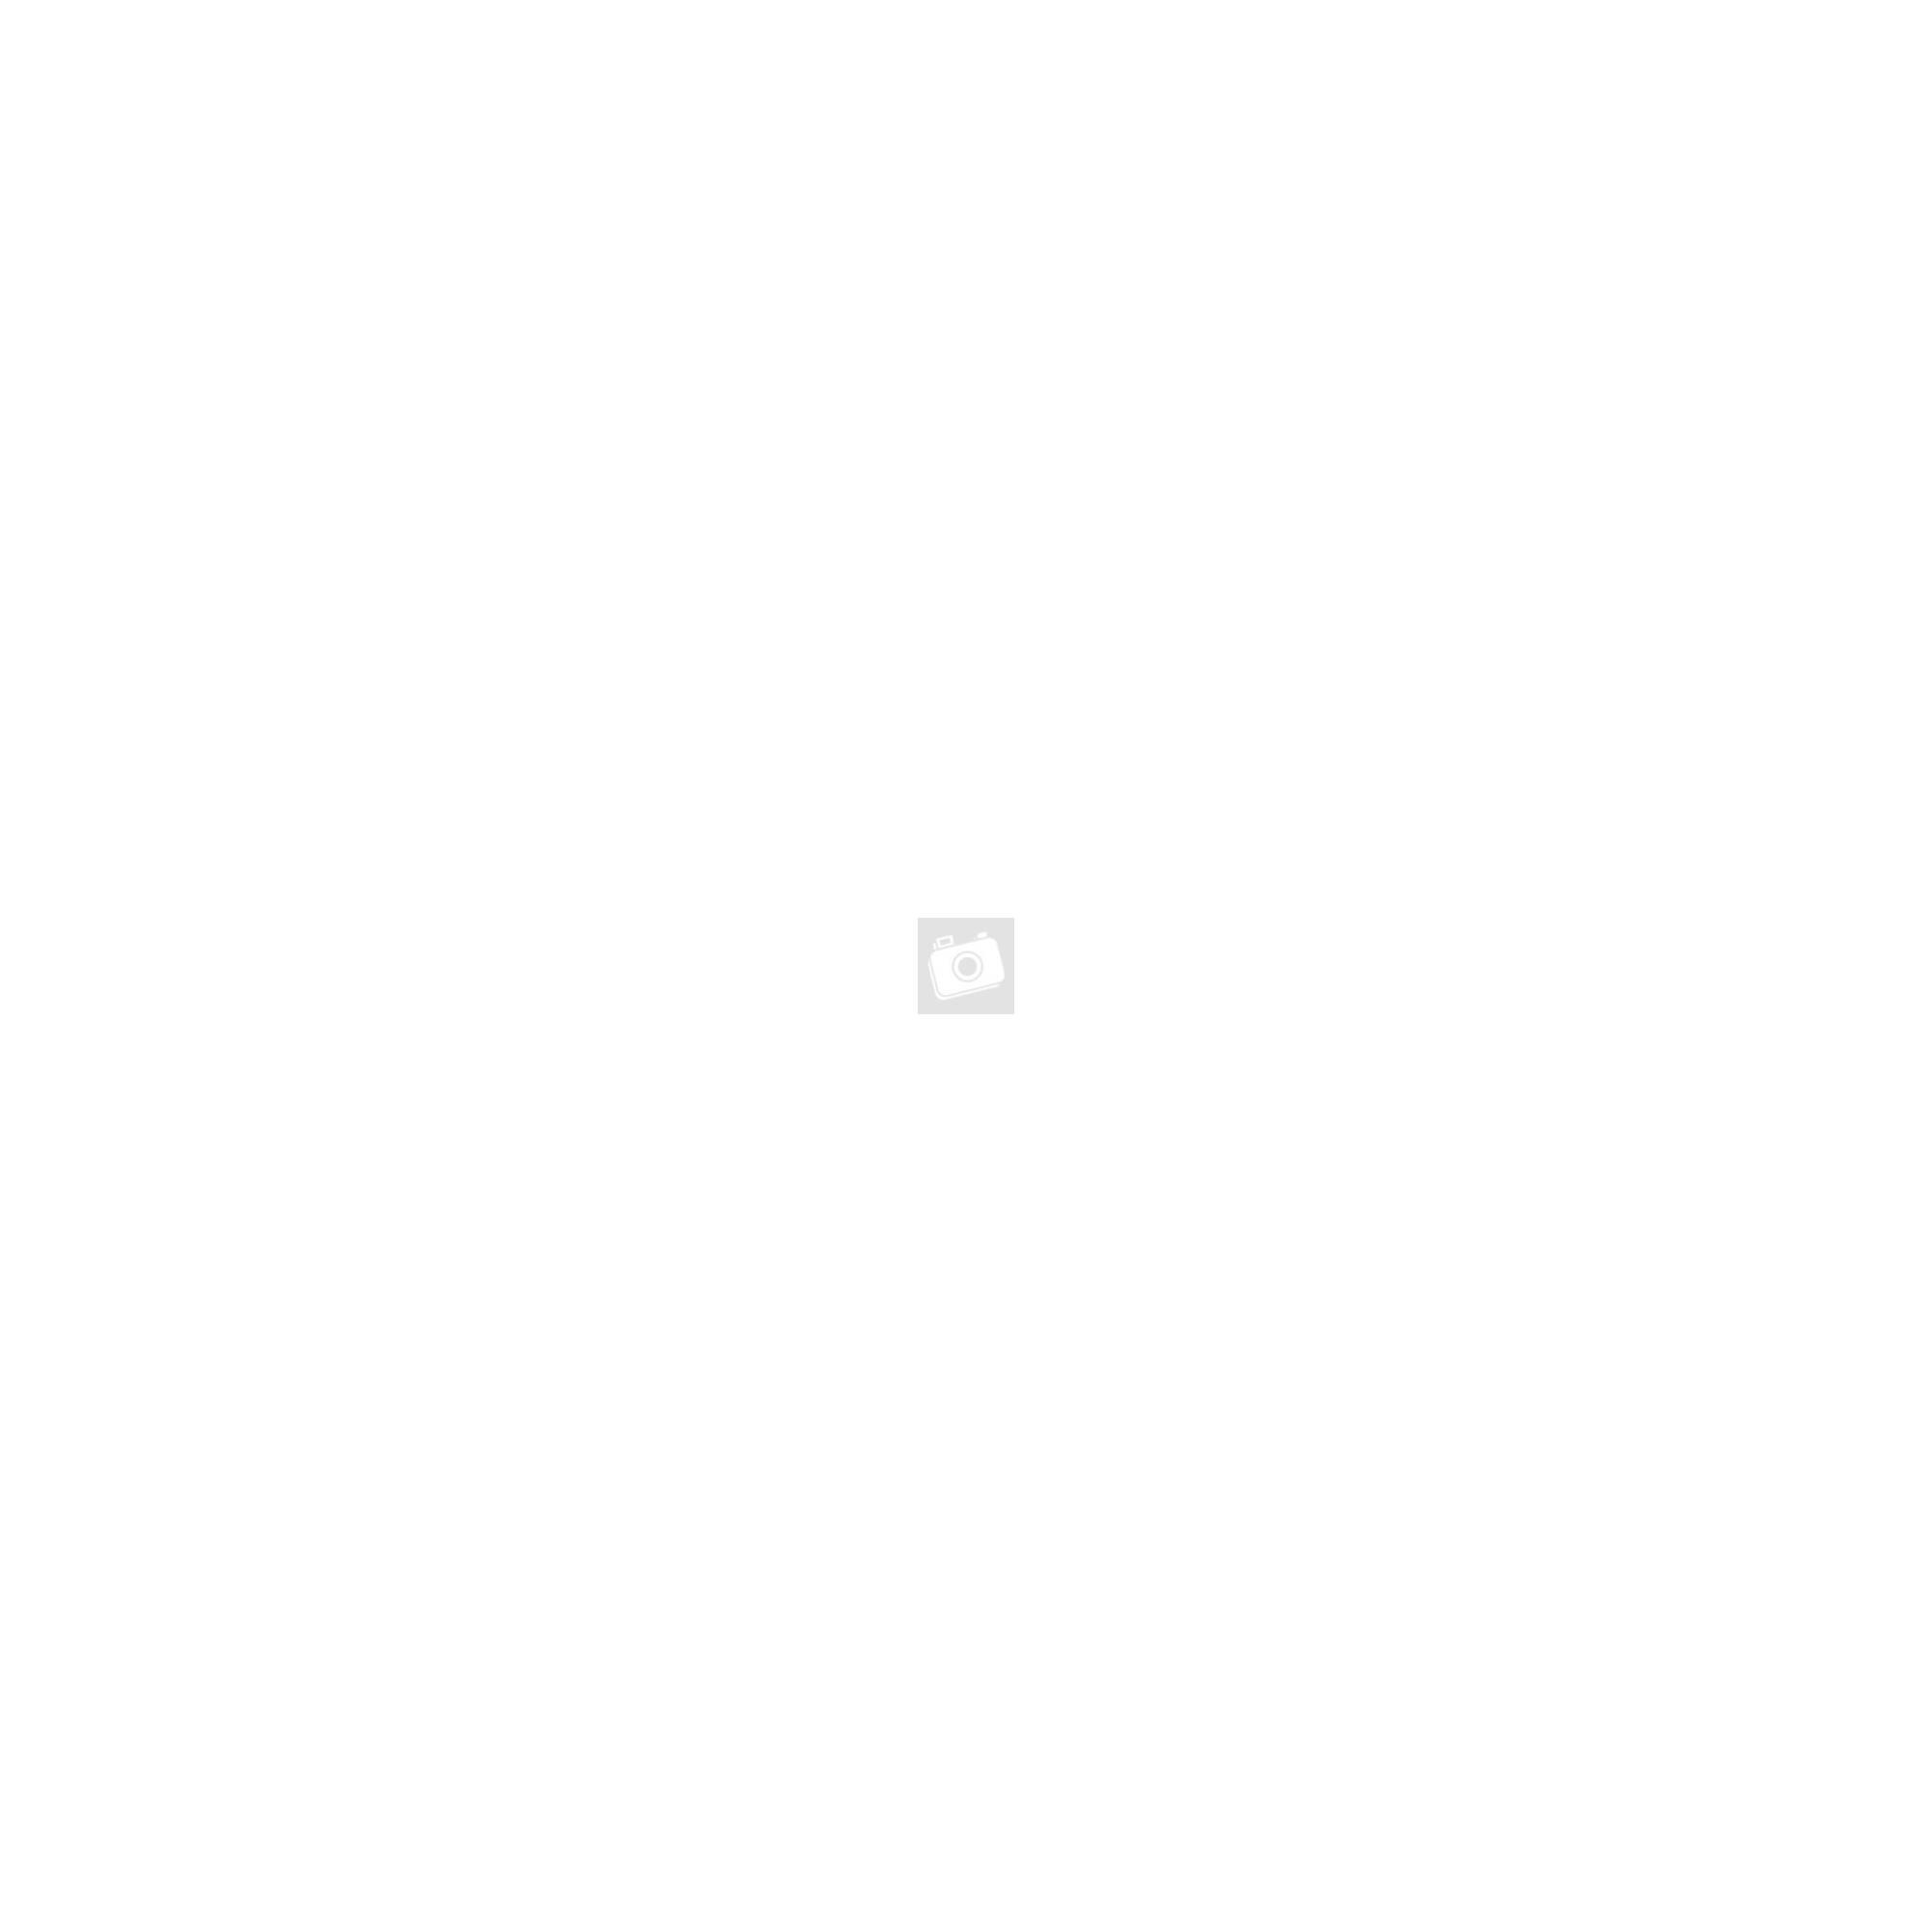 41e378b400 CIPO AND BAXX - MILITARY#GR - Férfi Téli kabát - Prémium kategória